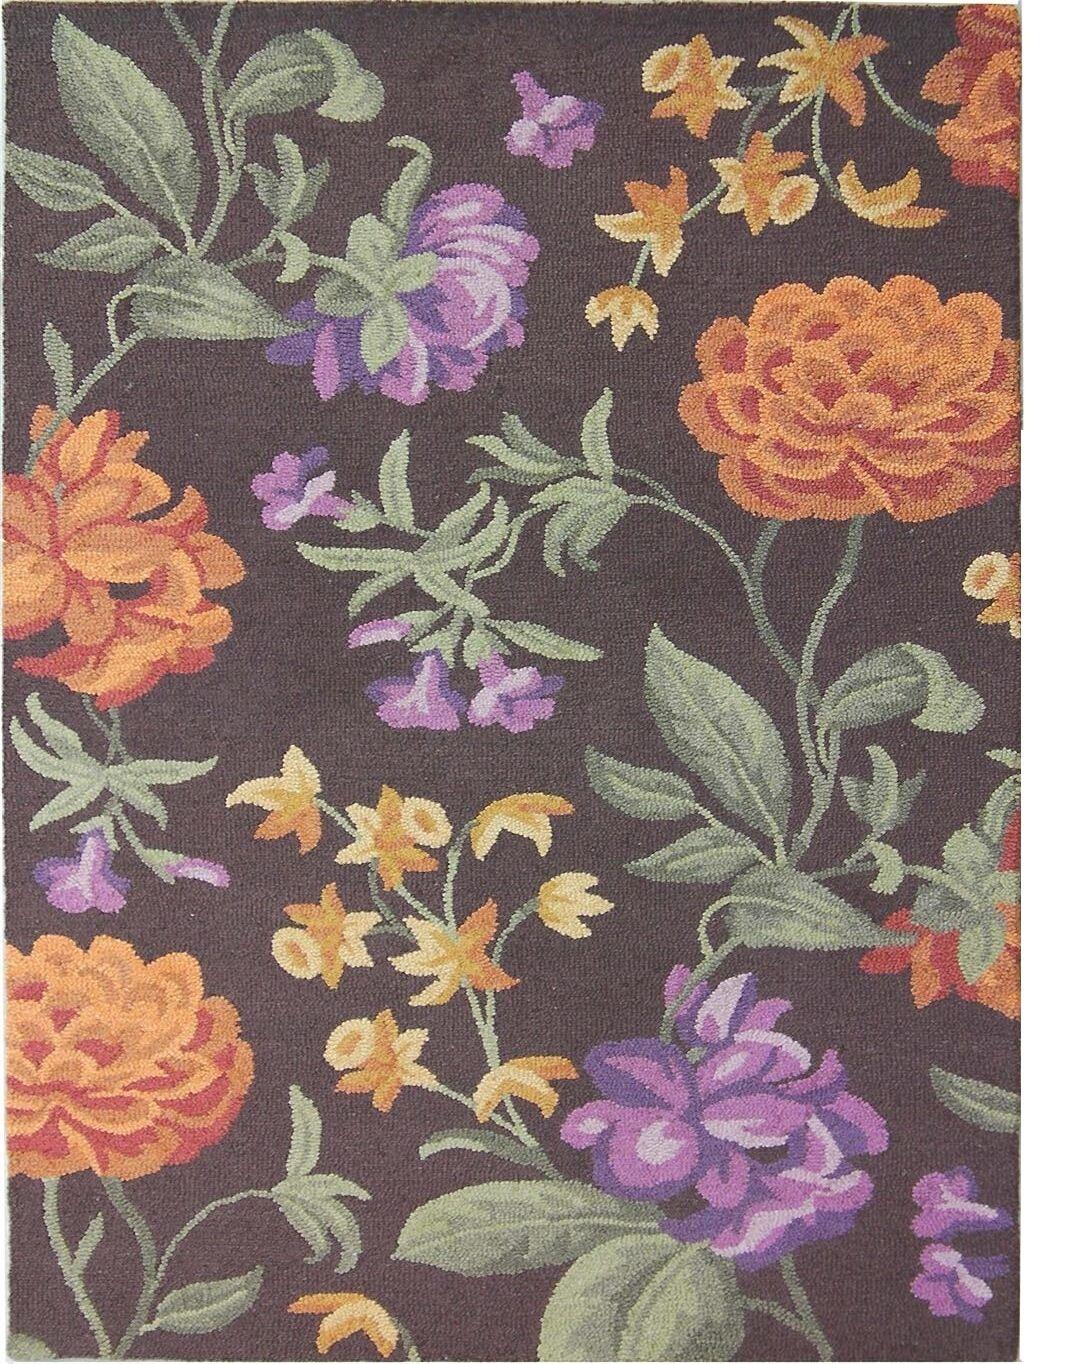 Ginger Brown Floral Area Rug Rug Size: Rectangle 8' x 10'